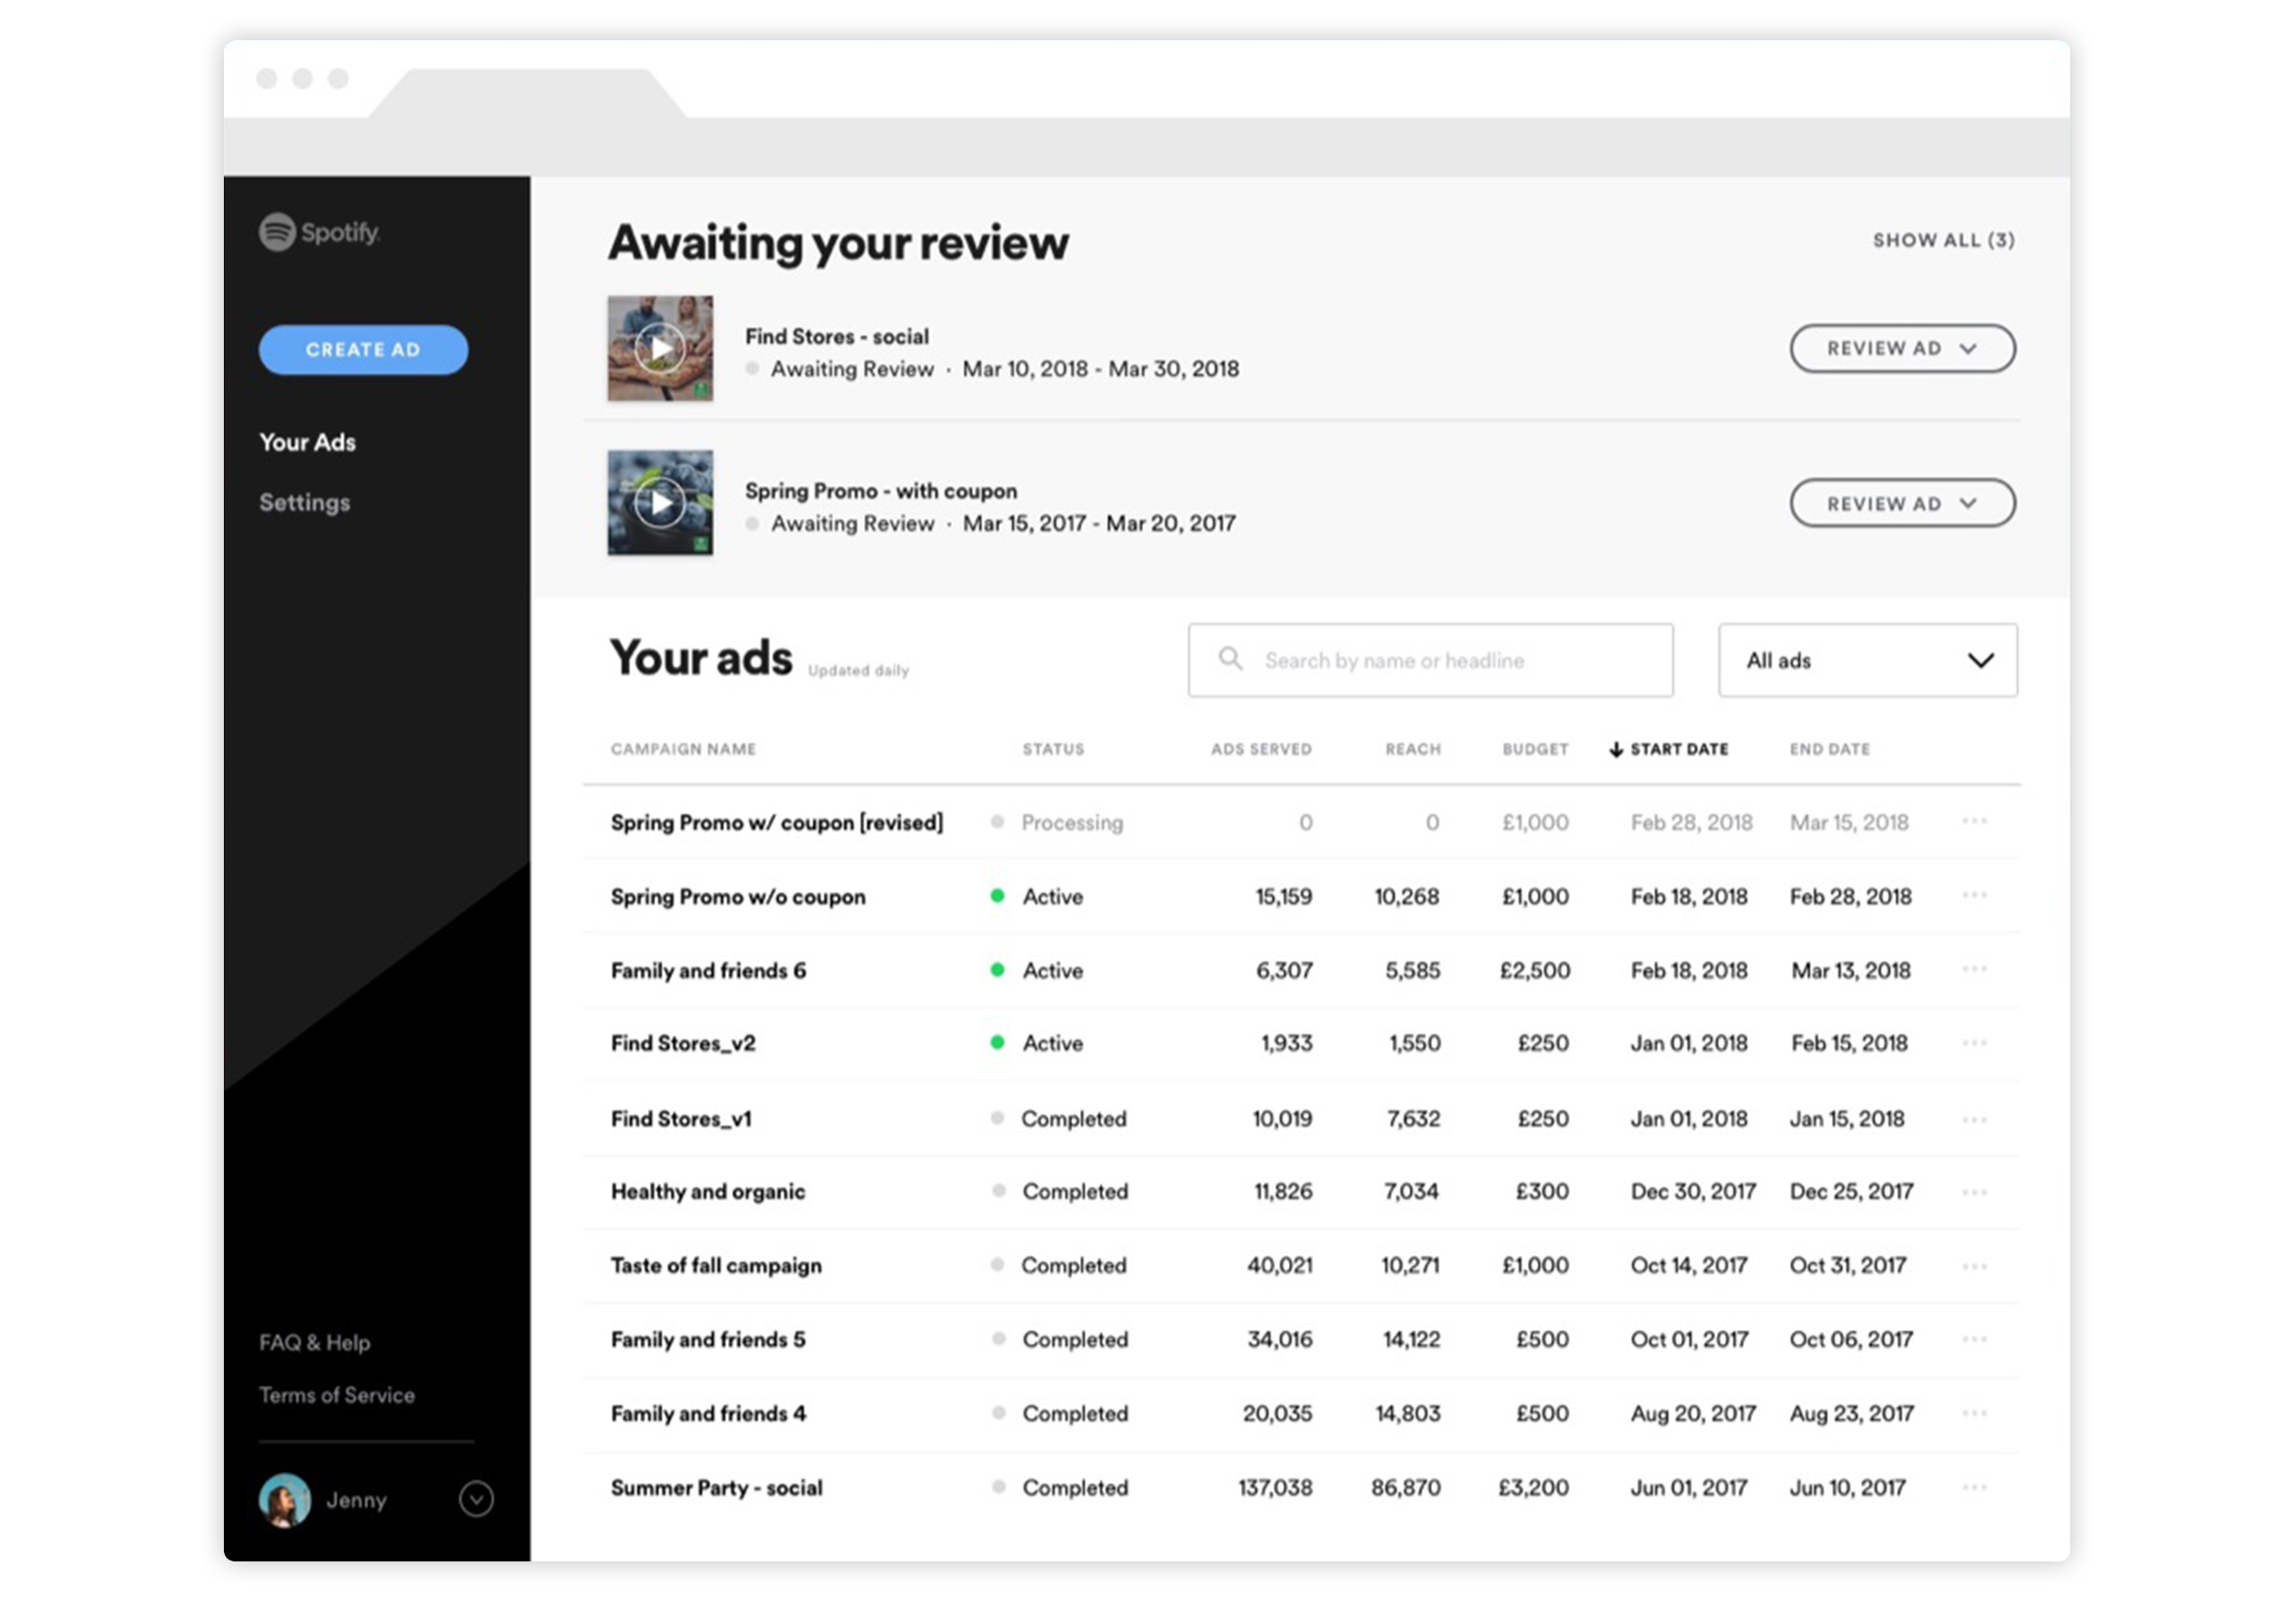 Screenshot of the Spotify Ad studio.